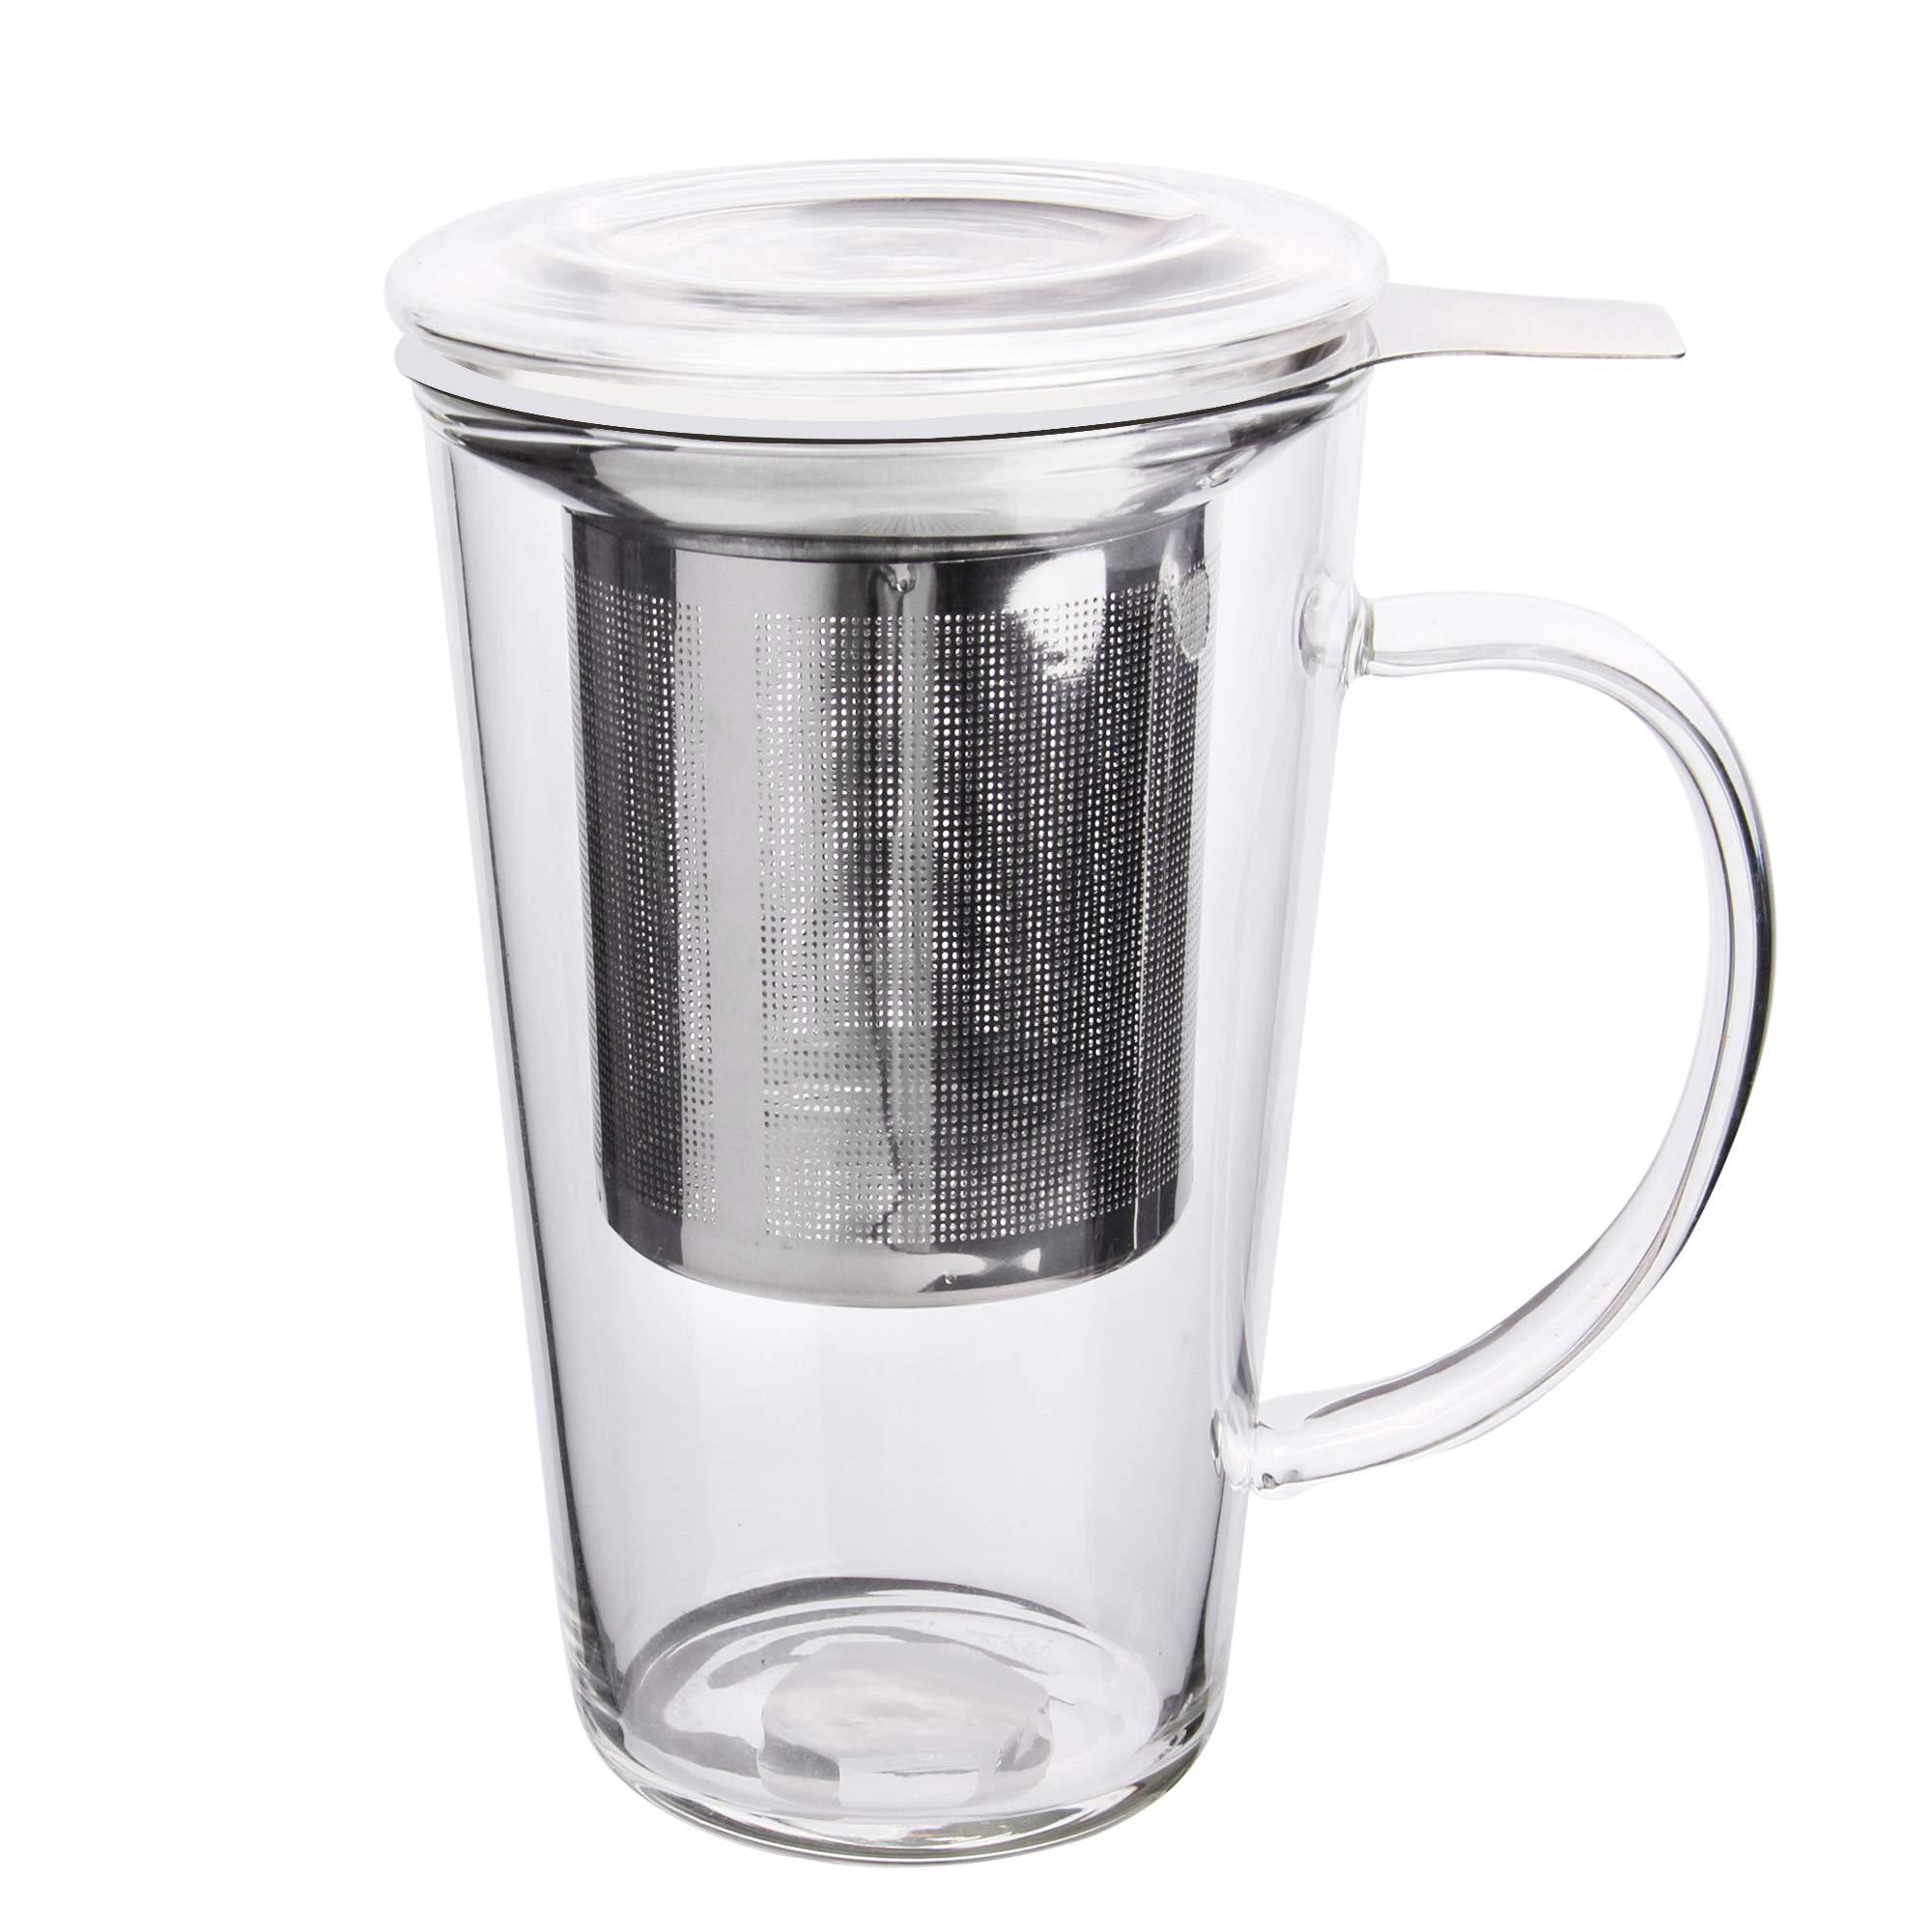 Enindel Fashion Simple Style Tea Mug with Infuser and Lid Glass Tea Cup 16 OZ (16 OZ Glass set of 1)